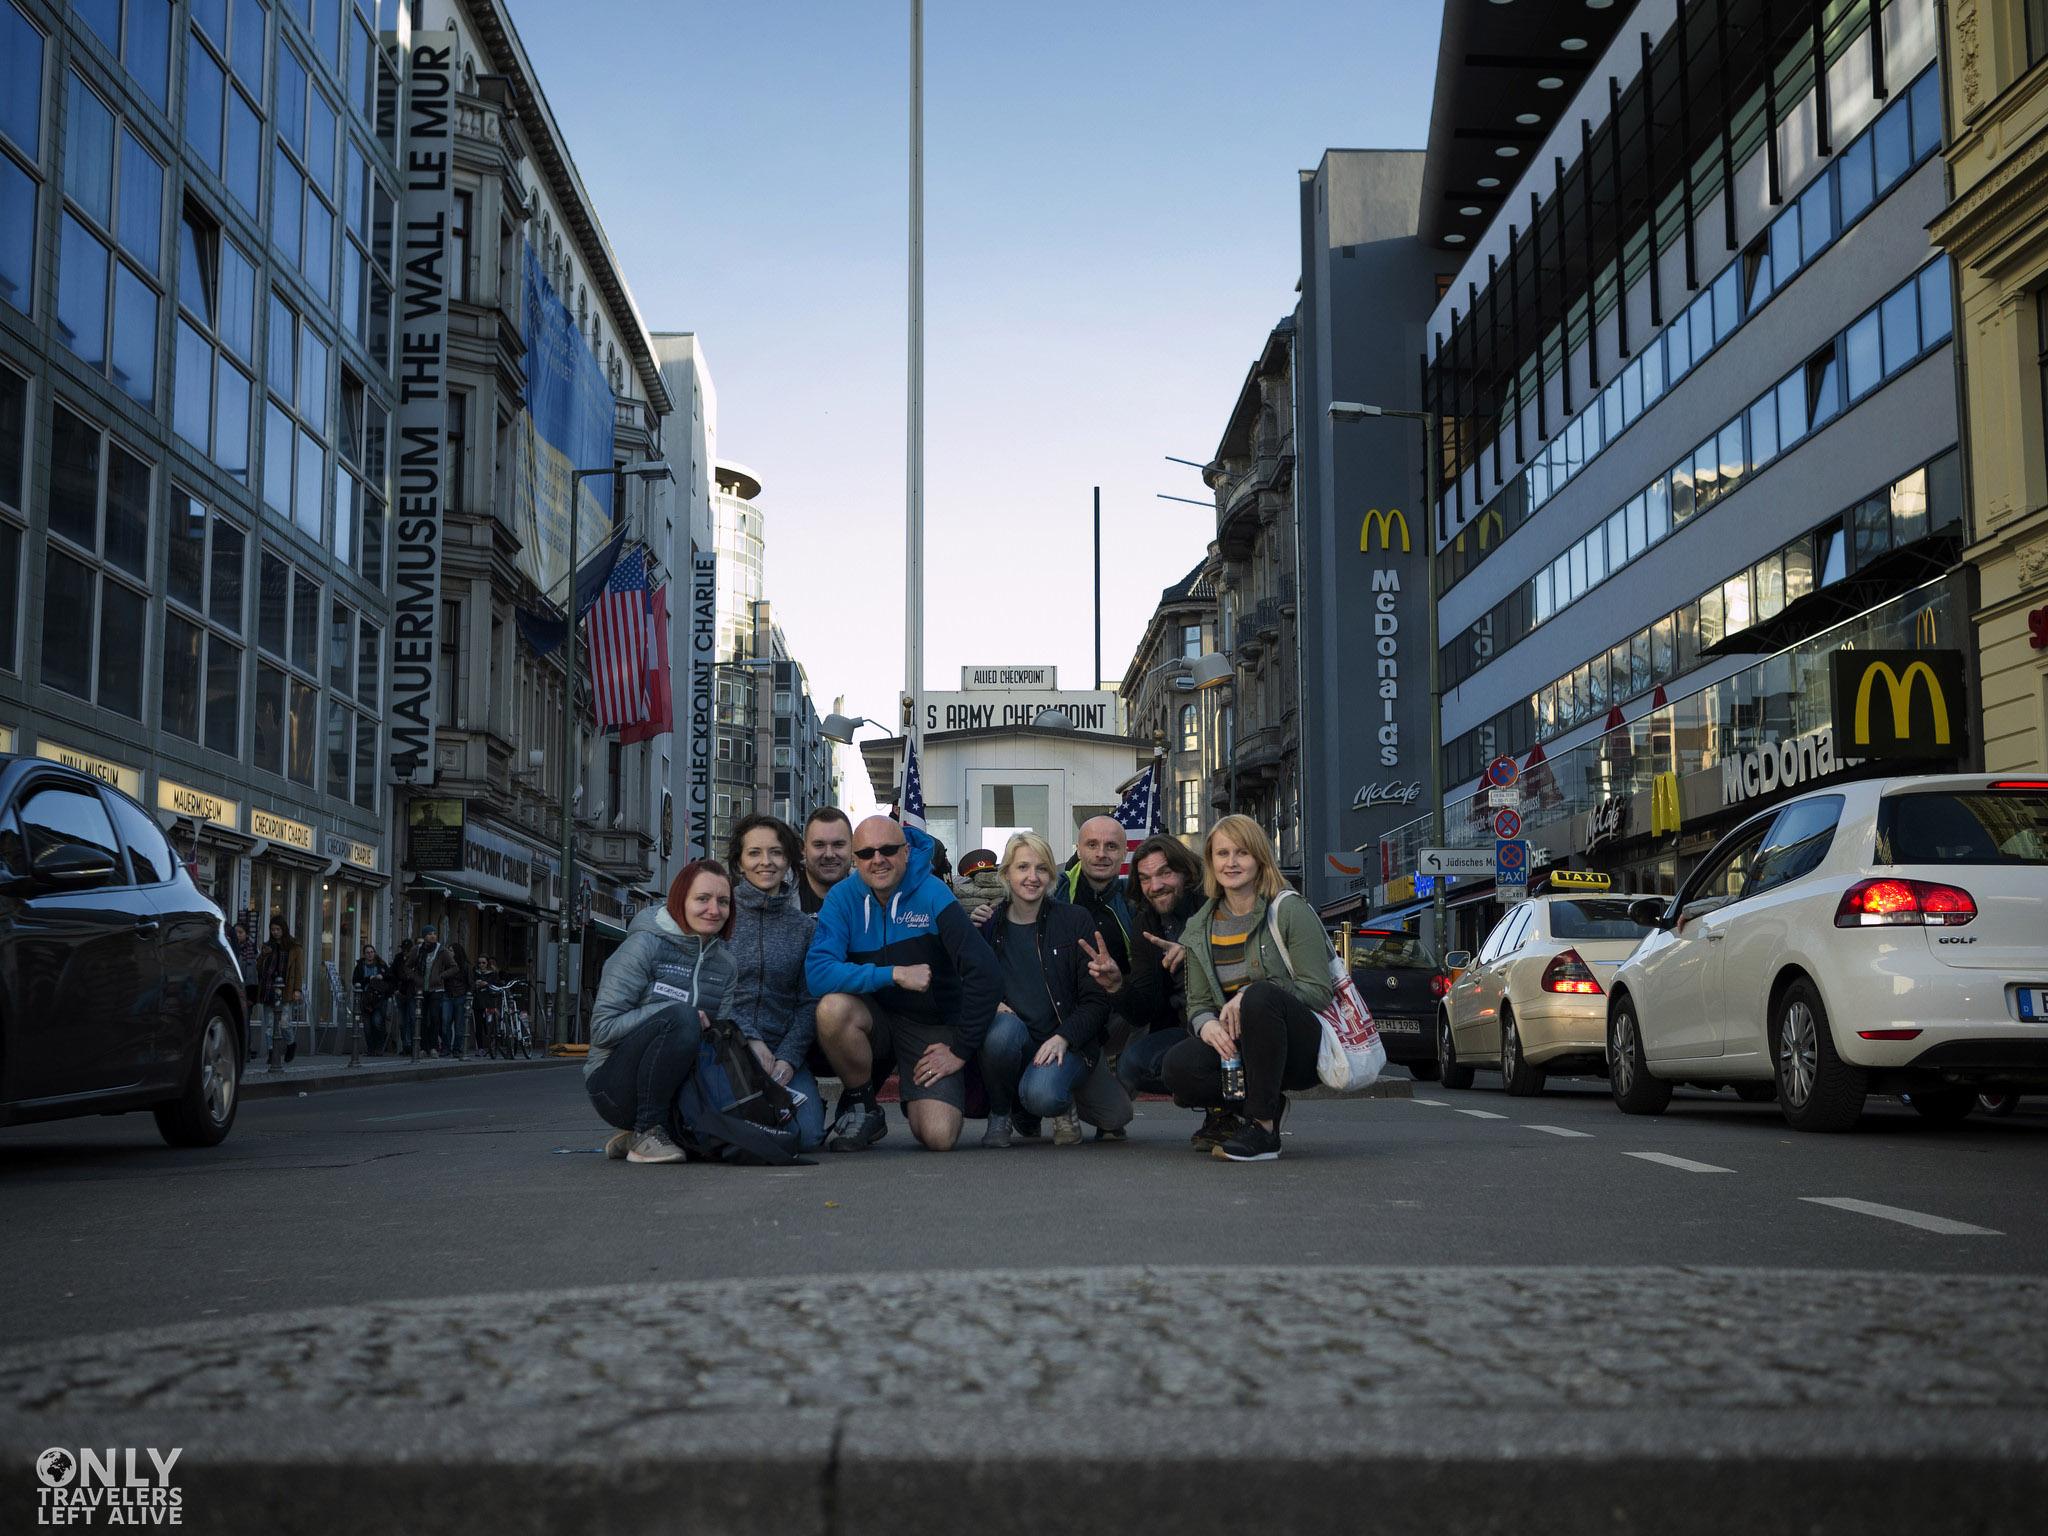 Berlin Checkpoint Charlie